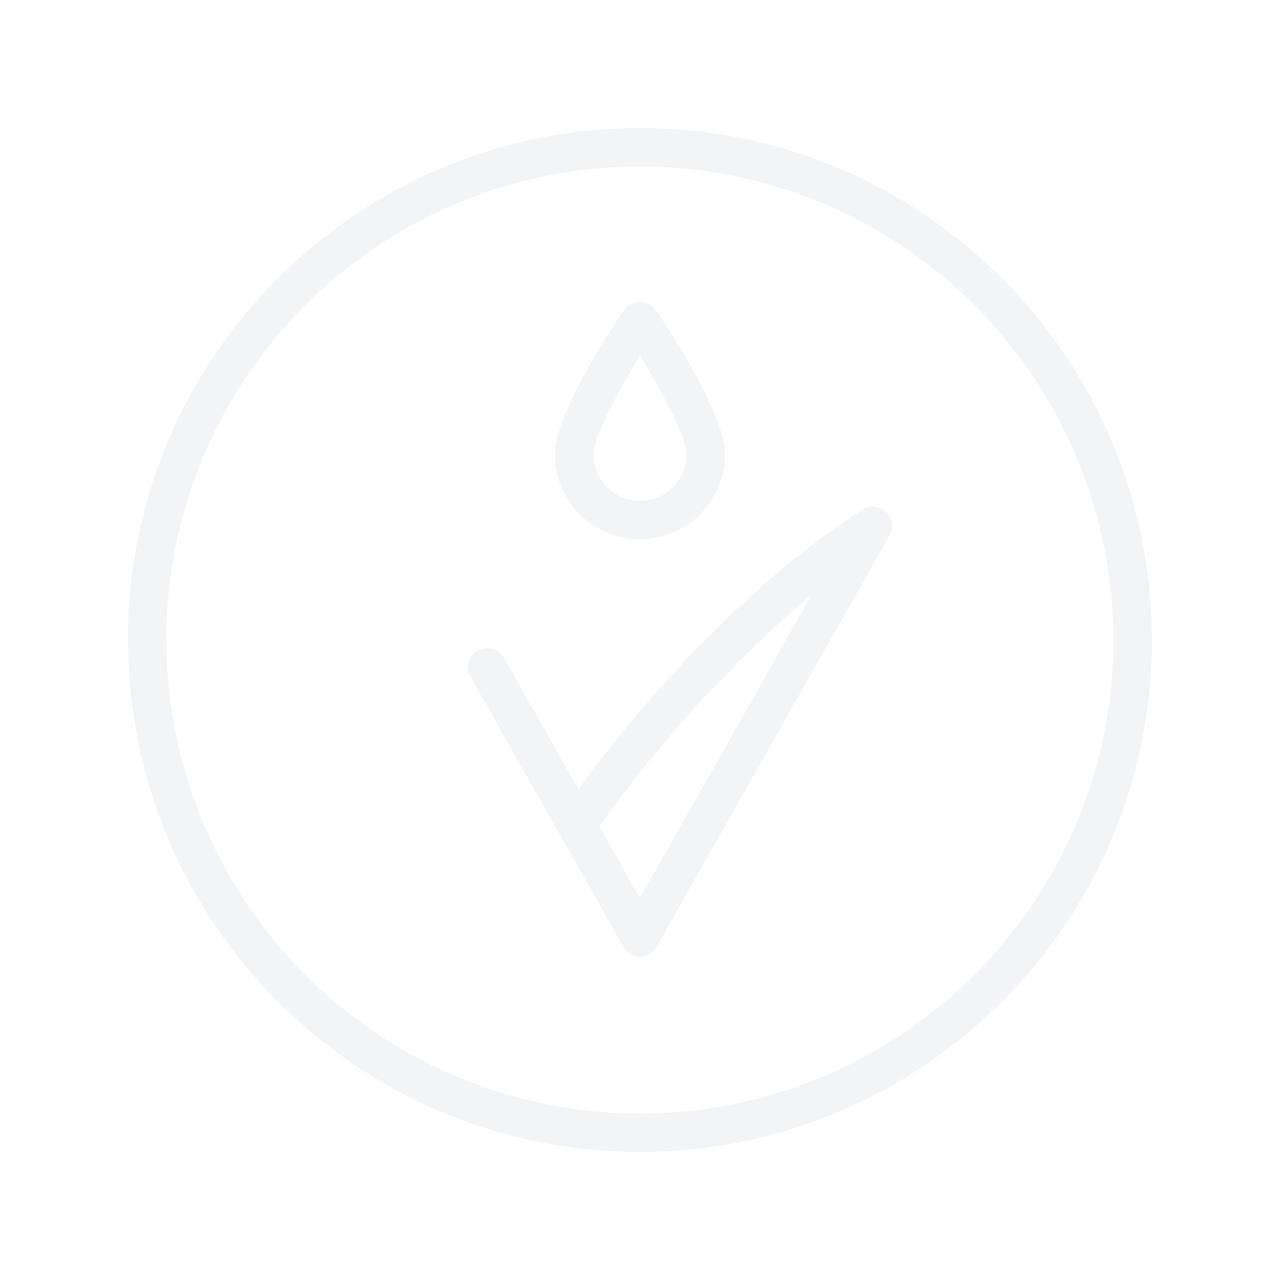 VICHY Ideal Soleil Antioxidant Solar Protective Water SPF30 200ml